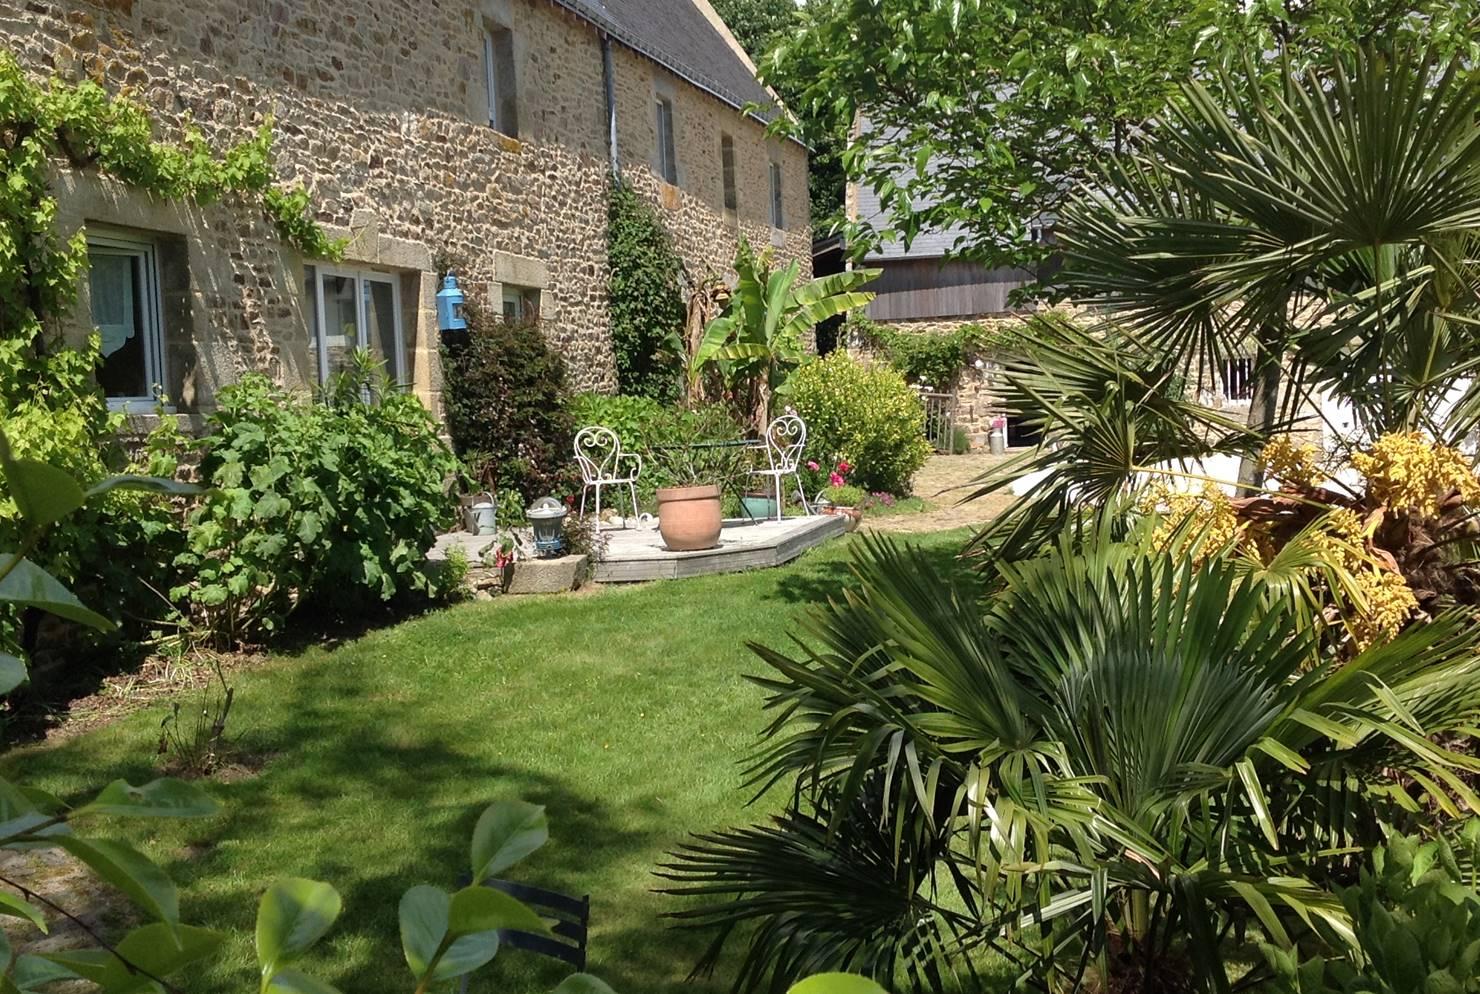 Talvern - Chambres et table d'hôtes en Bretagne sud- en bordure de ria d'Etel